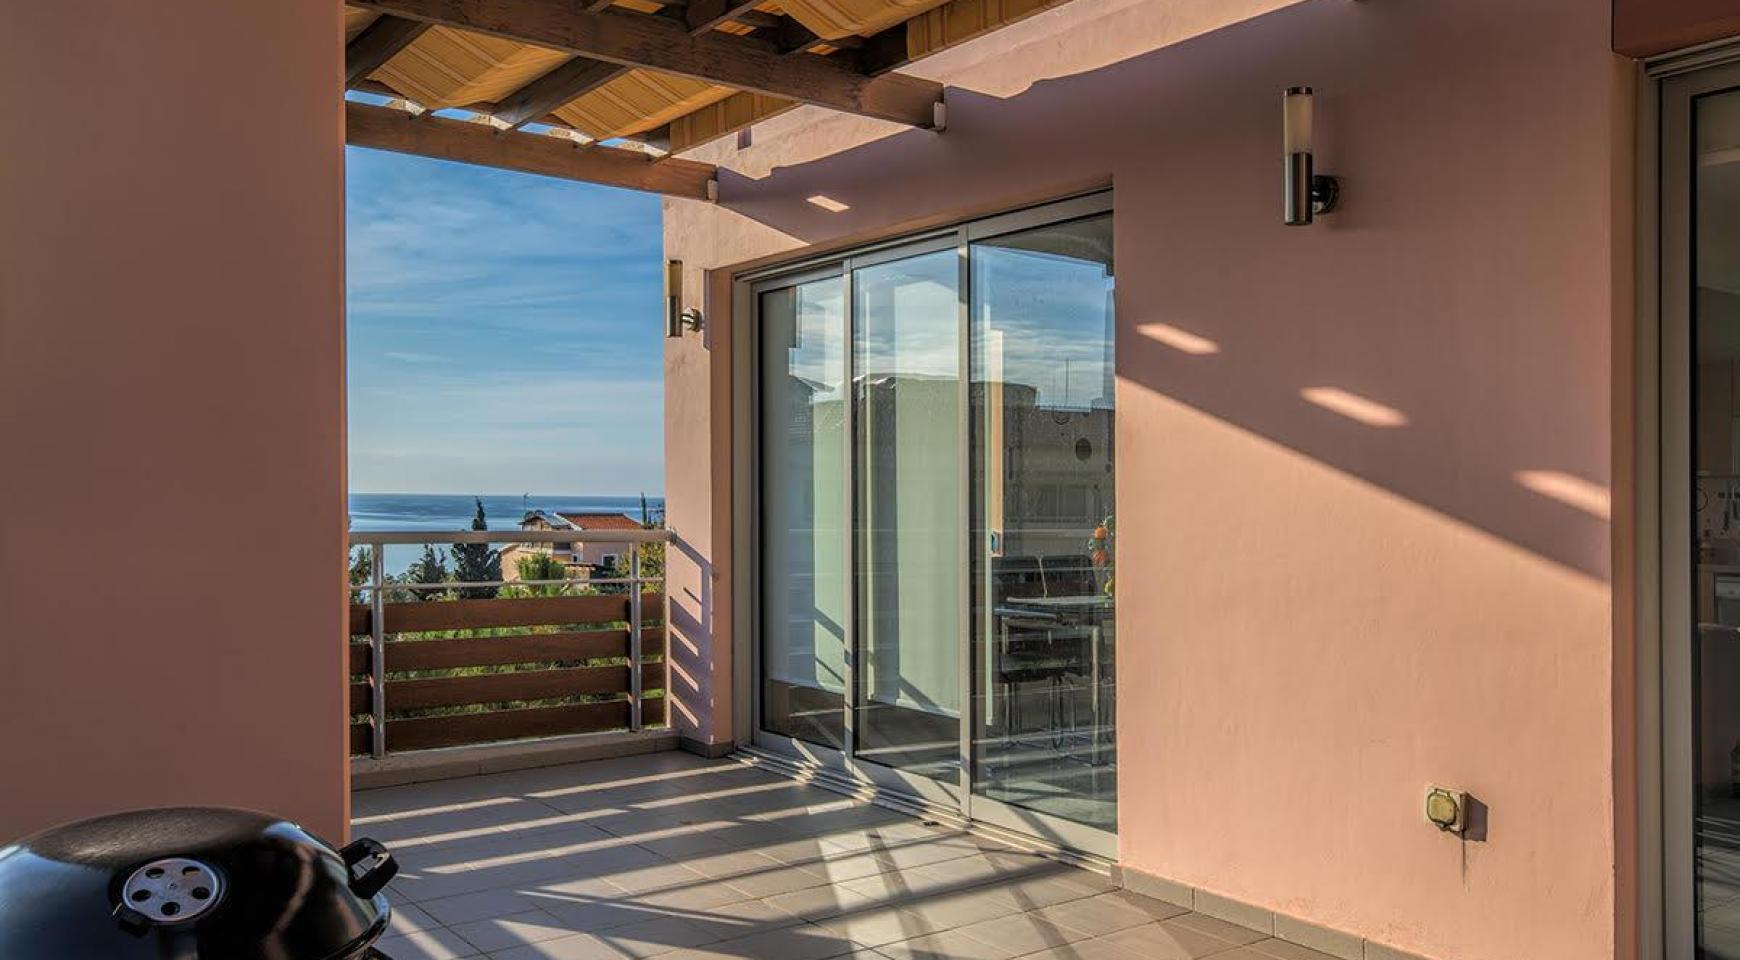 2 Bedroom Duplex Apartment Amathusa O 104 in a Prestigious Complex near the Sea  - 5